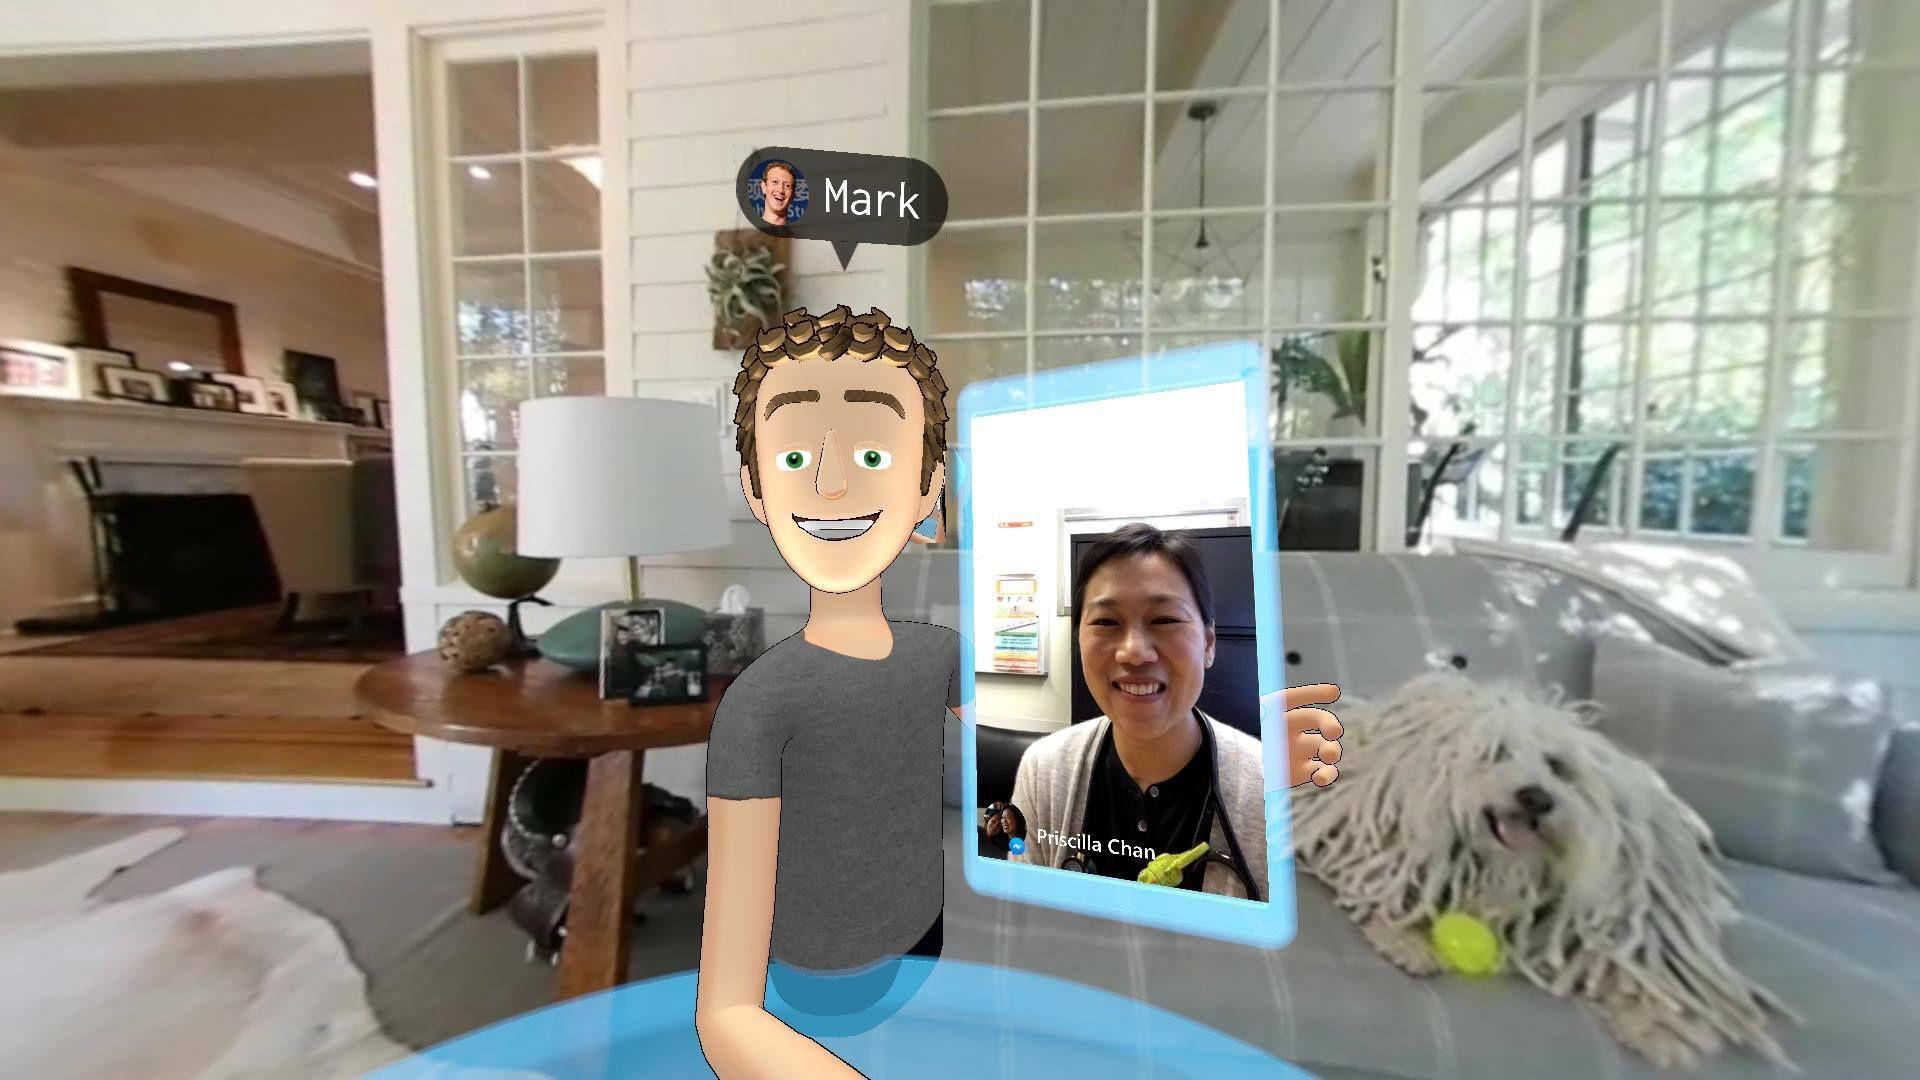 A selfie Mark Zuckerberg took while in VR